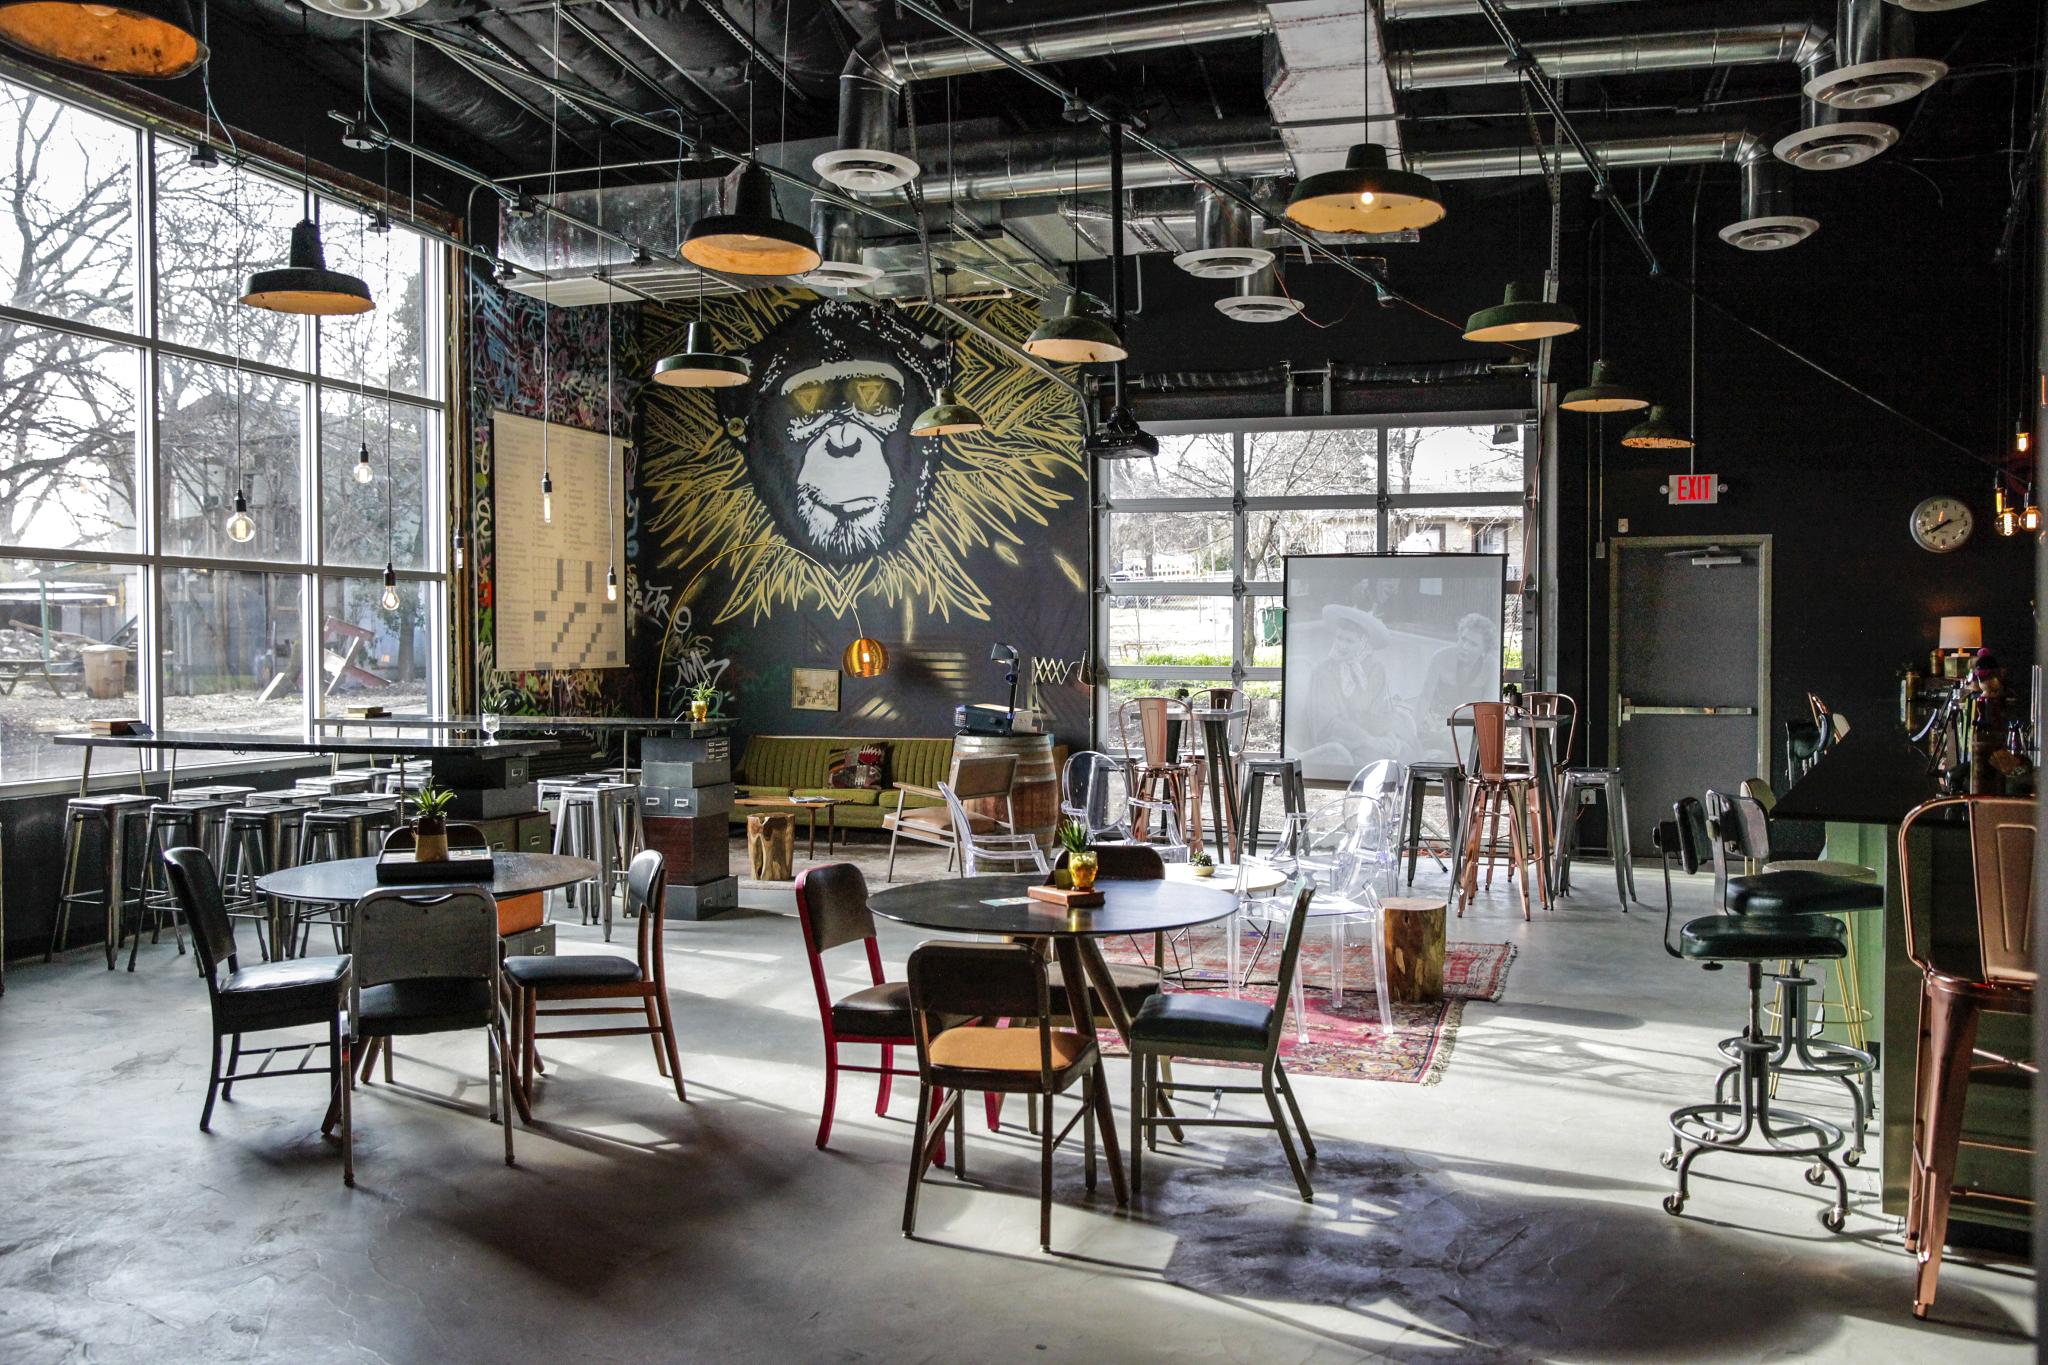 bar table chairs mural